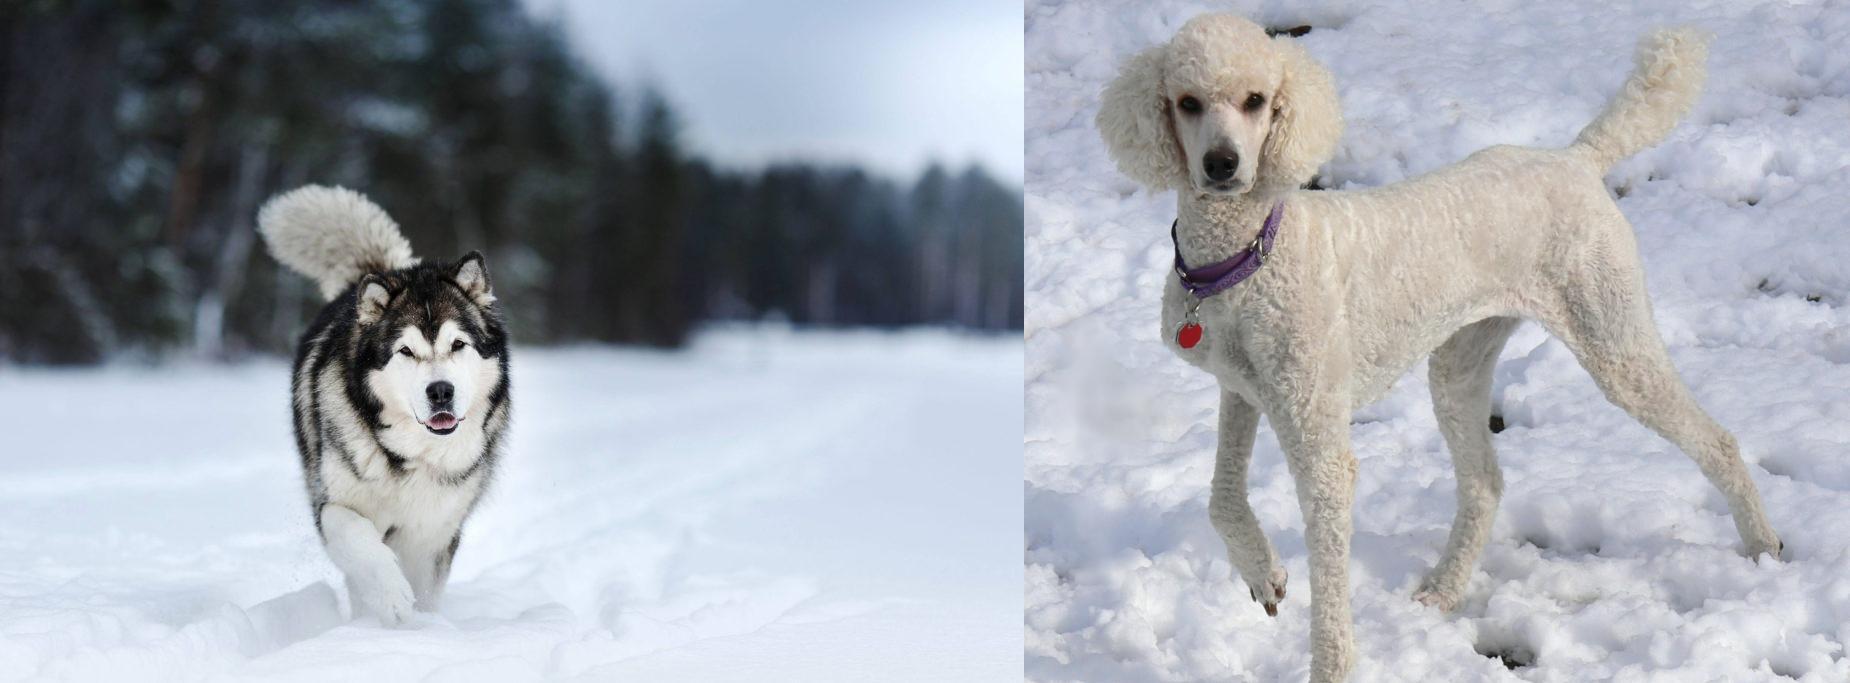 Siberian Husky Vs Poodle Breed Comparison Mydogbreeds